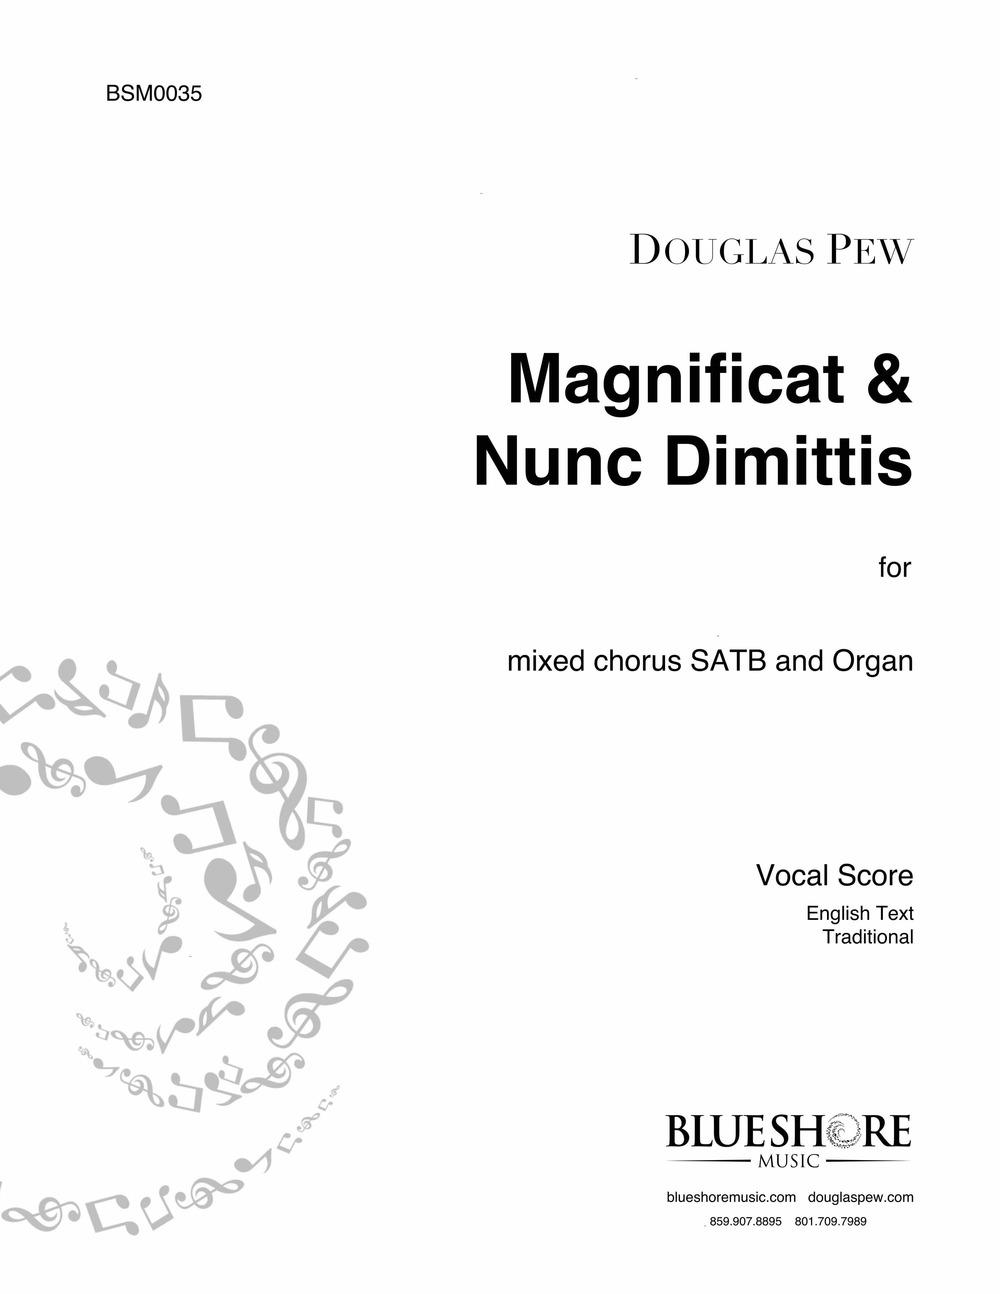 Magnificat & Nunc Dimittis (St. Thomas Service), for SATB and Organ